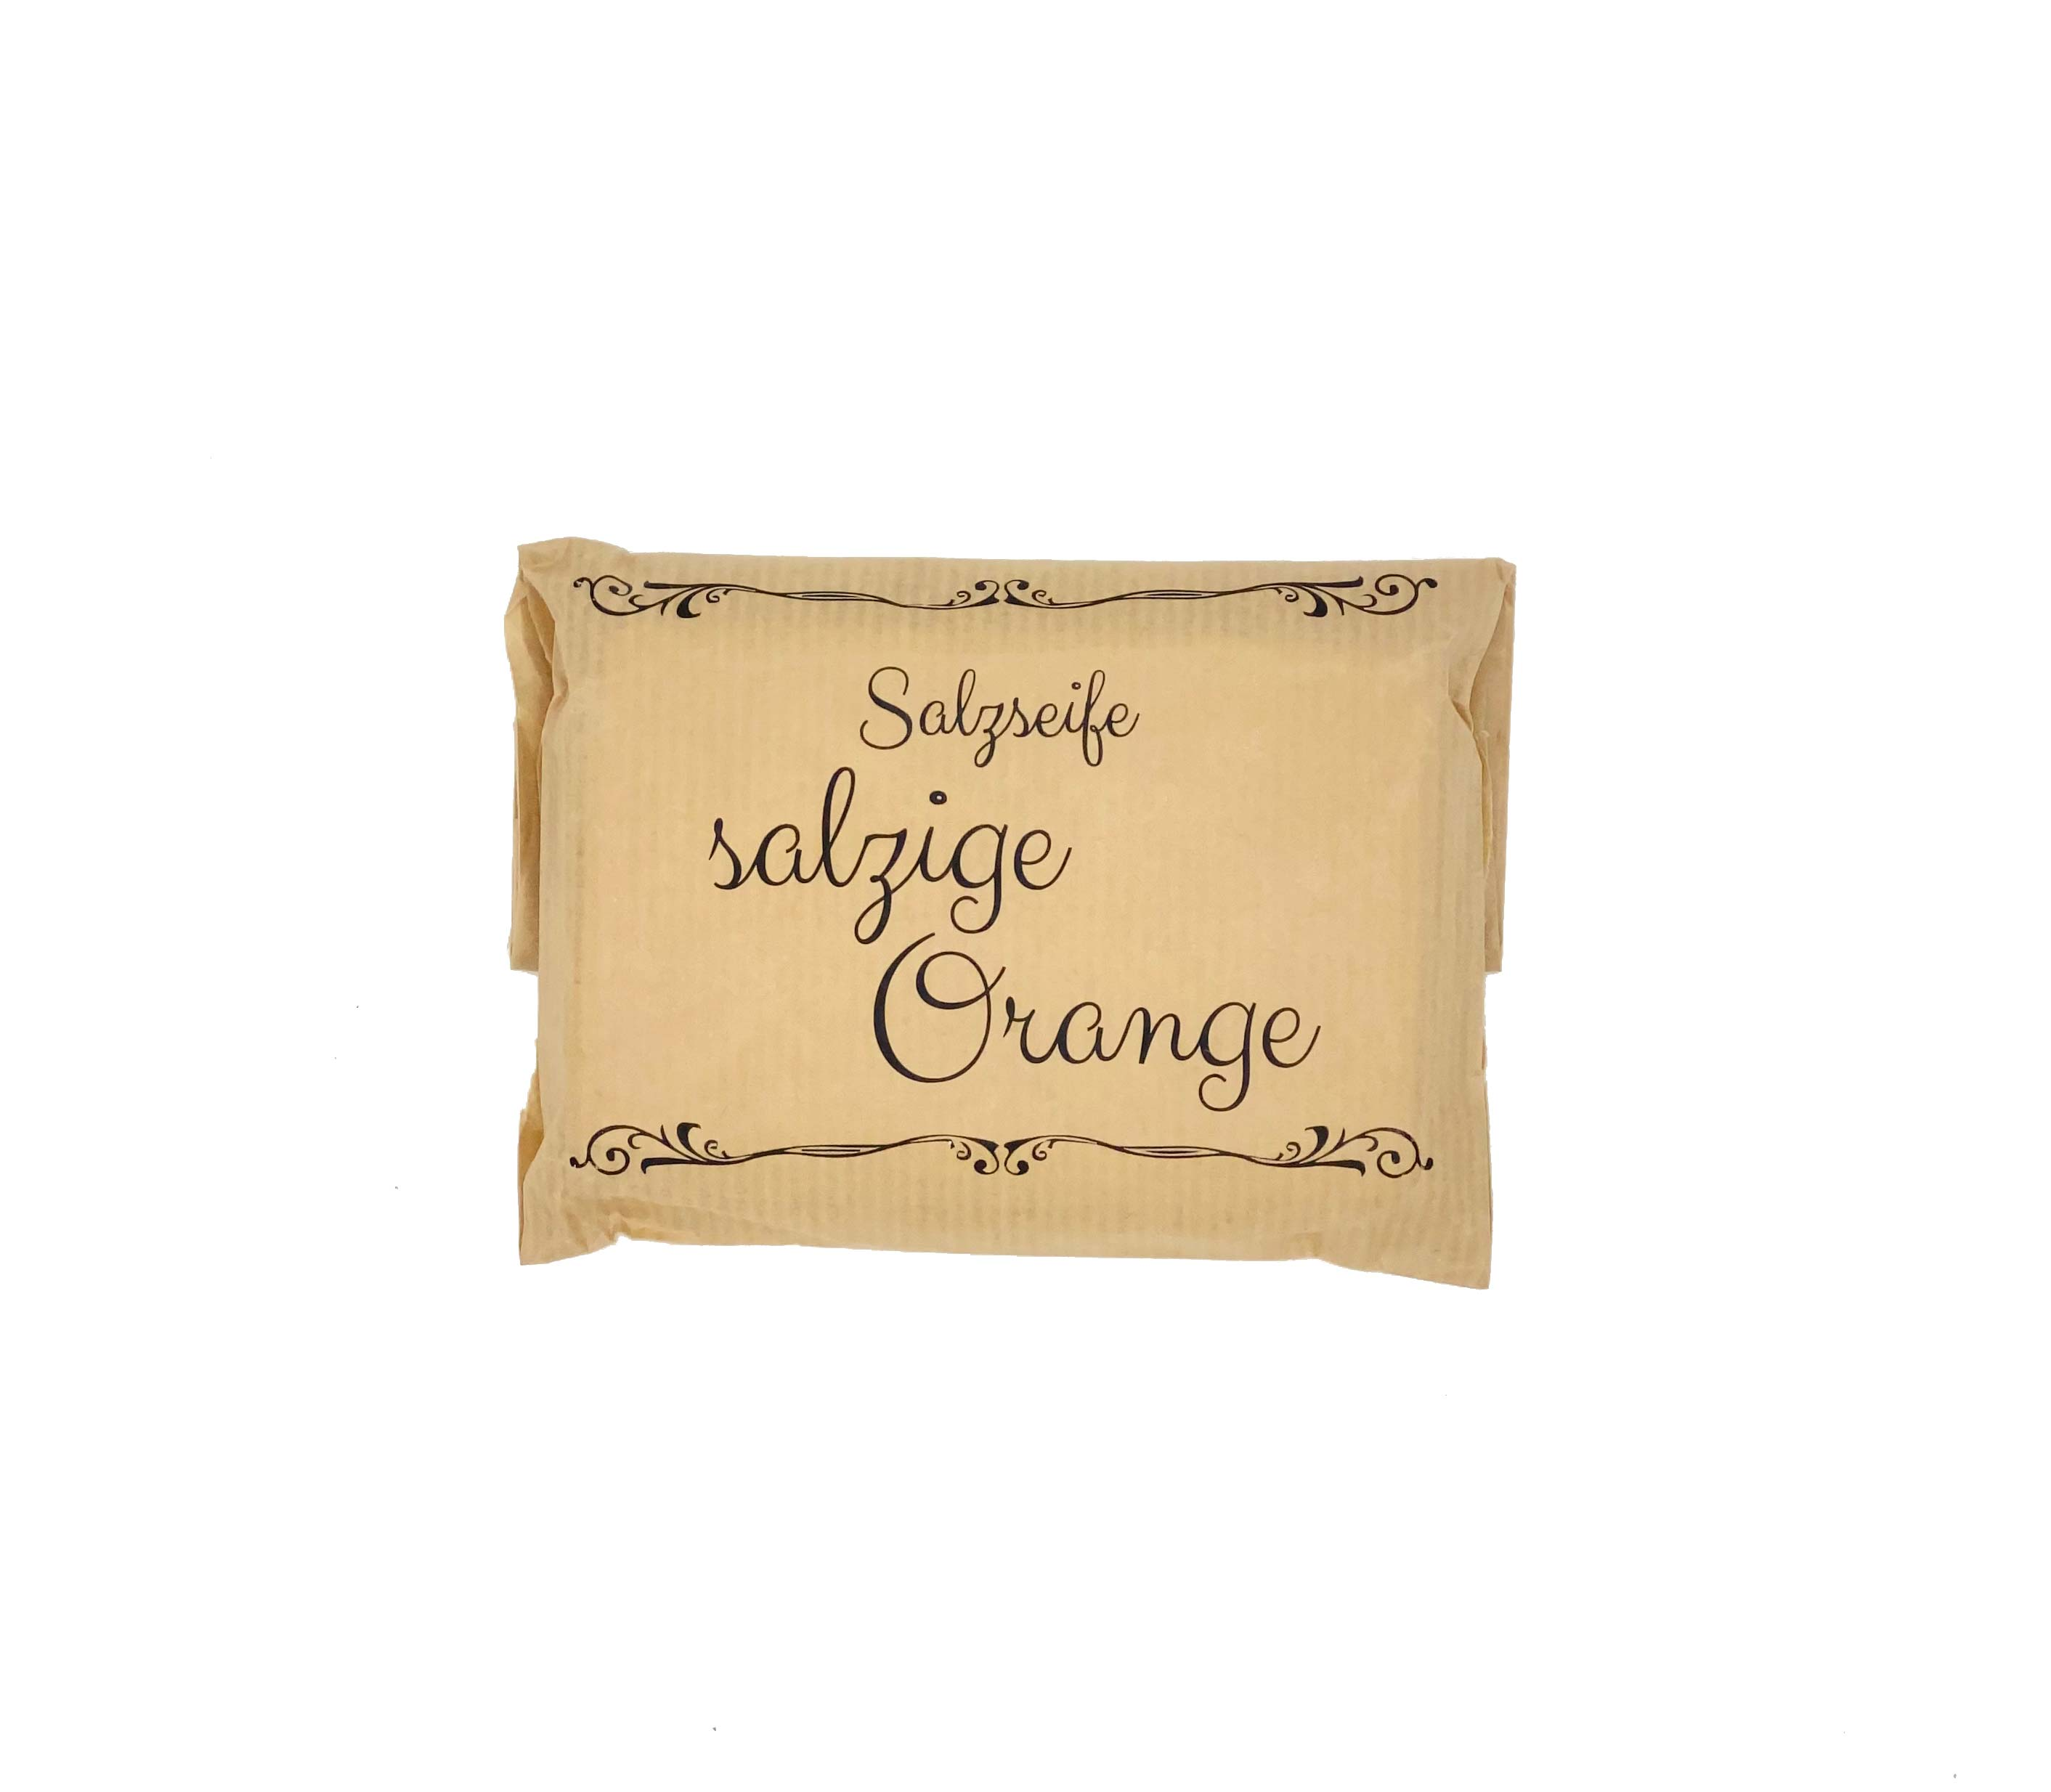 Wohlfühlseife salzige Orange